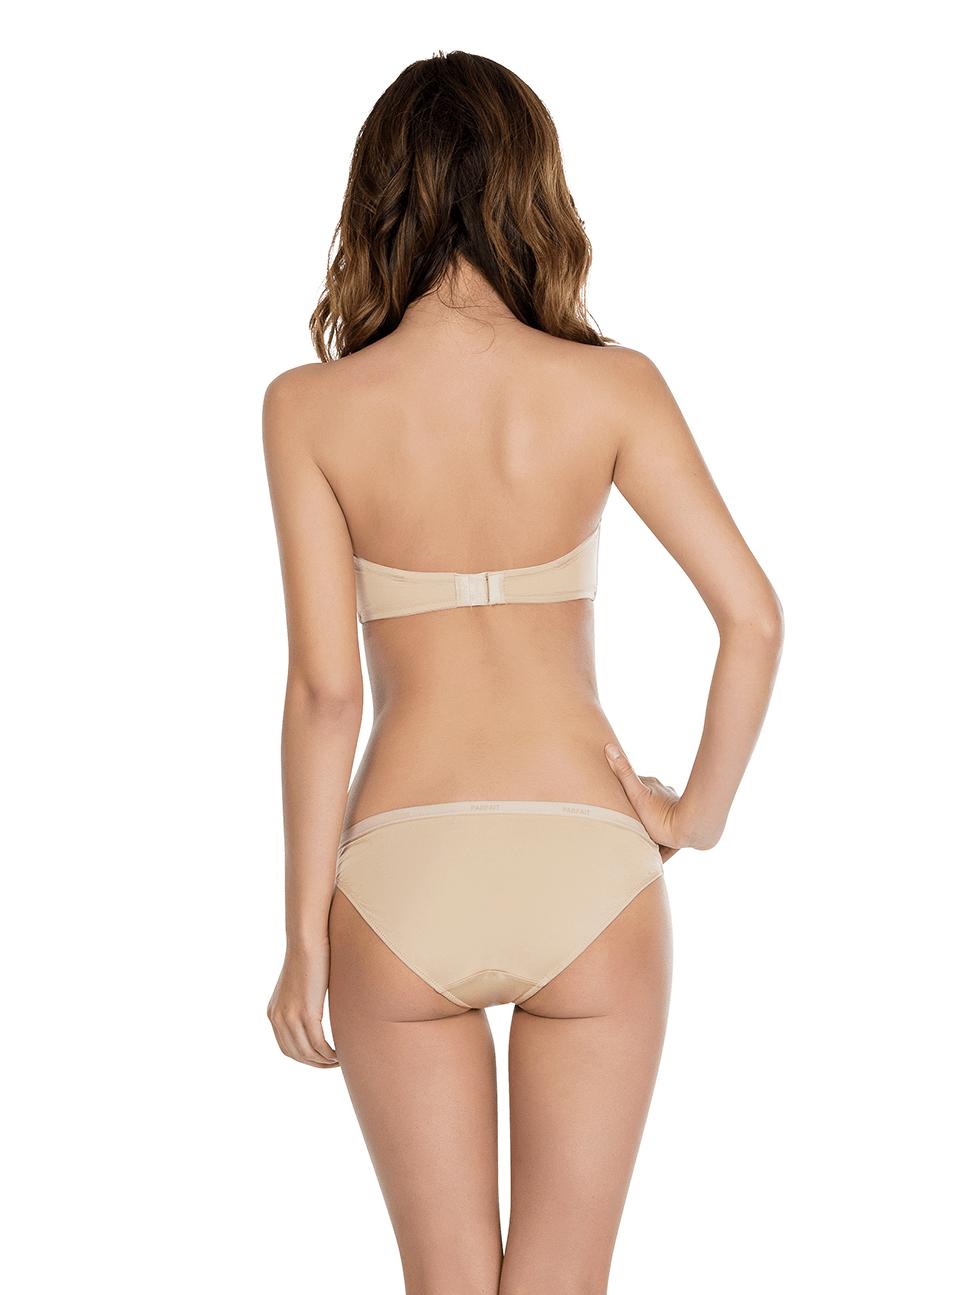 Lynn PushupStraplessBraP13112 BikiniP13013 Enude StraplessBack - Lynn Bikini - European Nude - P13013